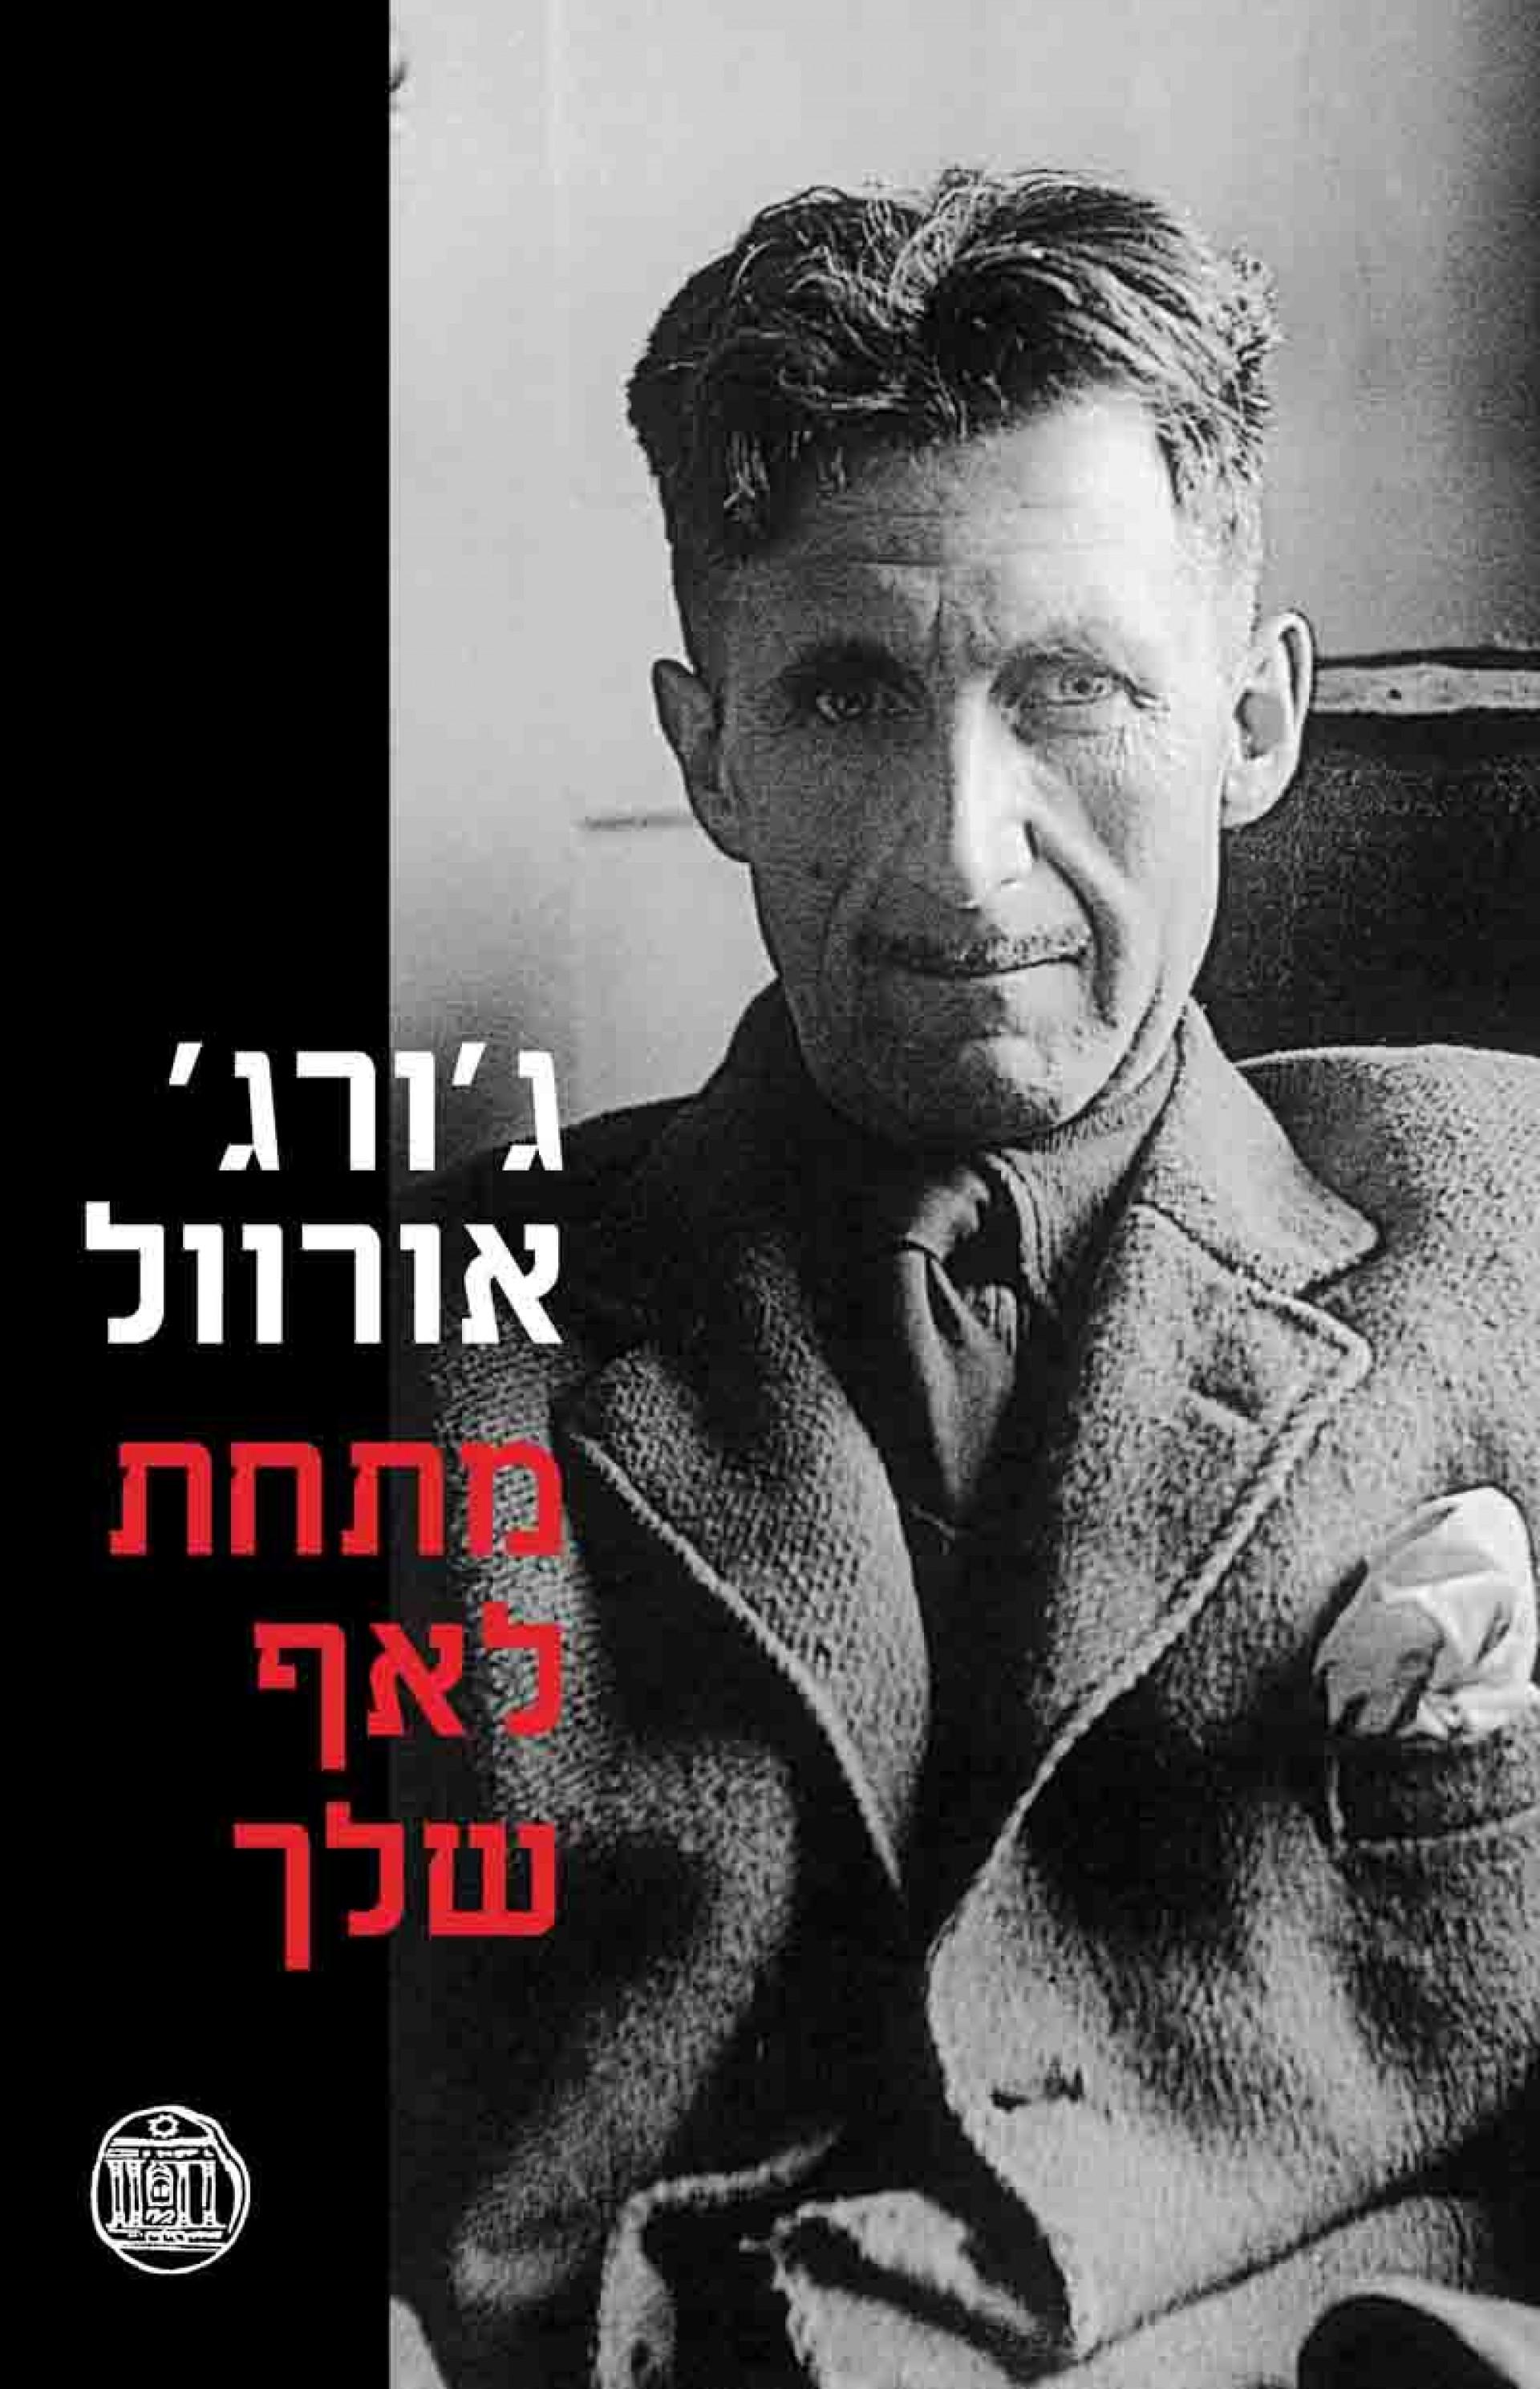 016 Mitahat Laaf Front George Orwell Essays Essay Frightening Everyman's Library Summary Bookshop Memories 1920